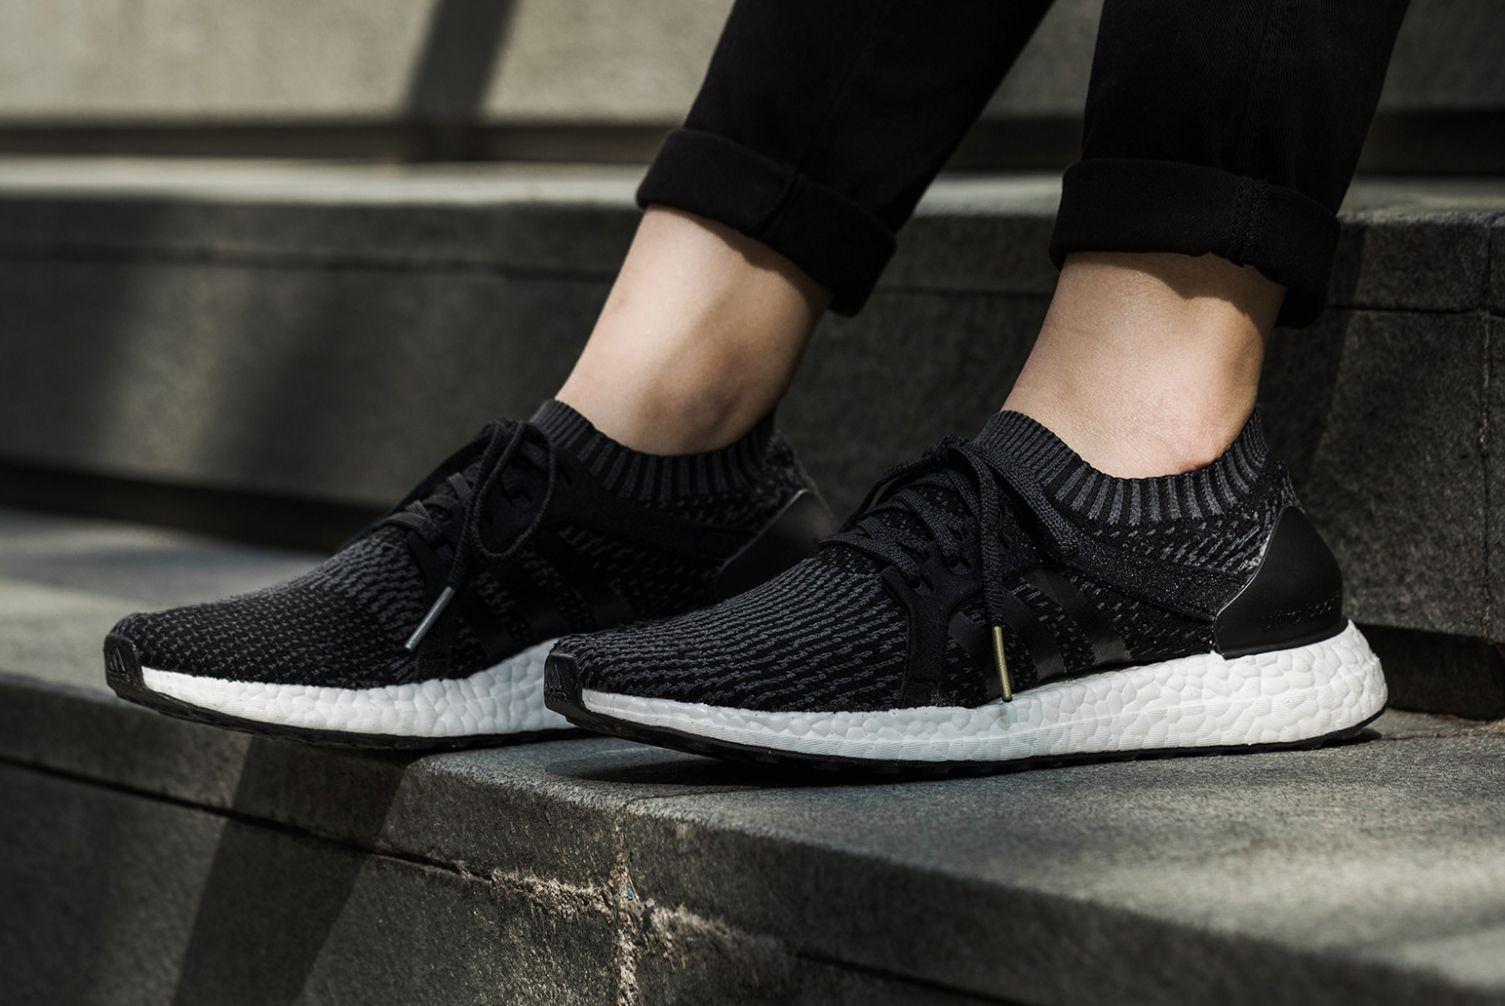 Adidas Ultraboost X Closer Look 6